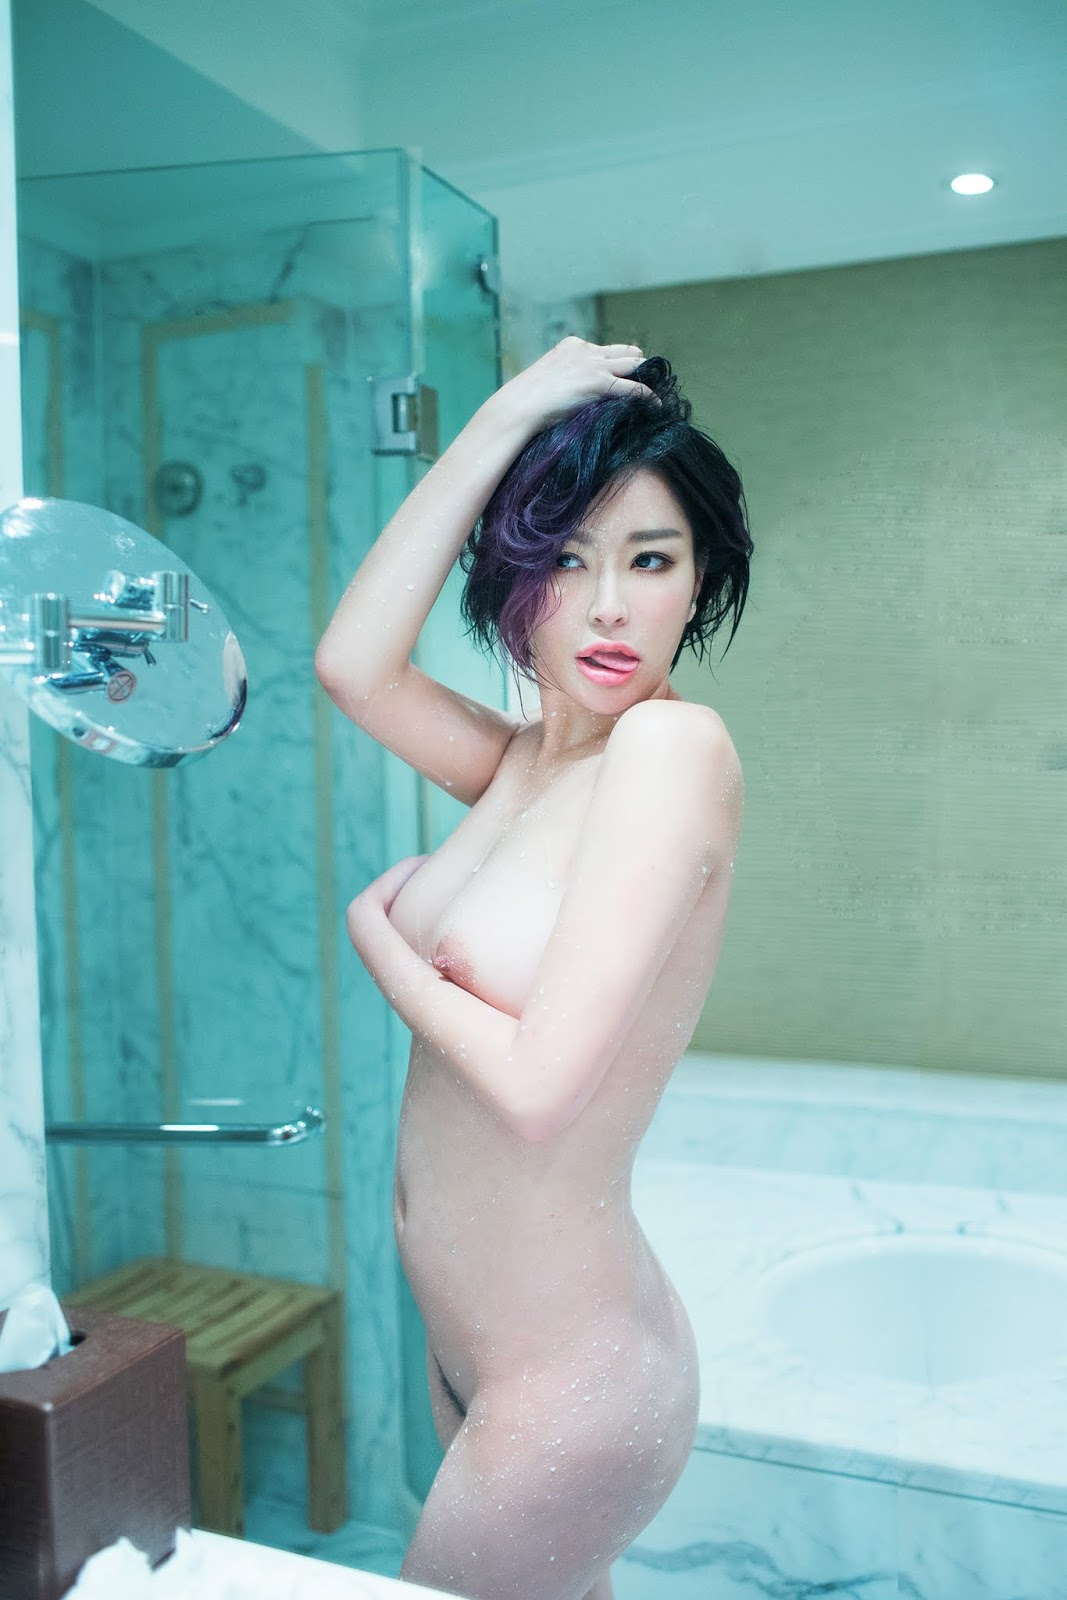 026 - Nude Girl TUIGIRL NO.45 Sexy Love Pussy